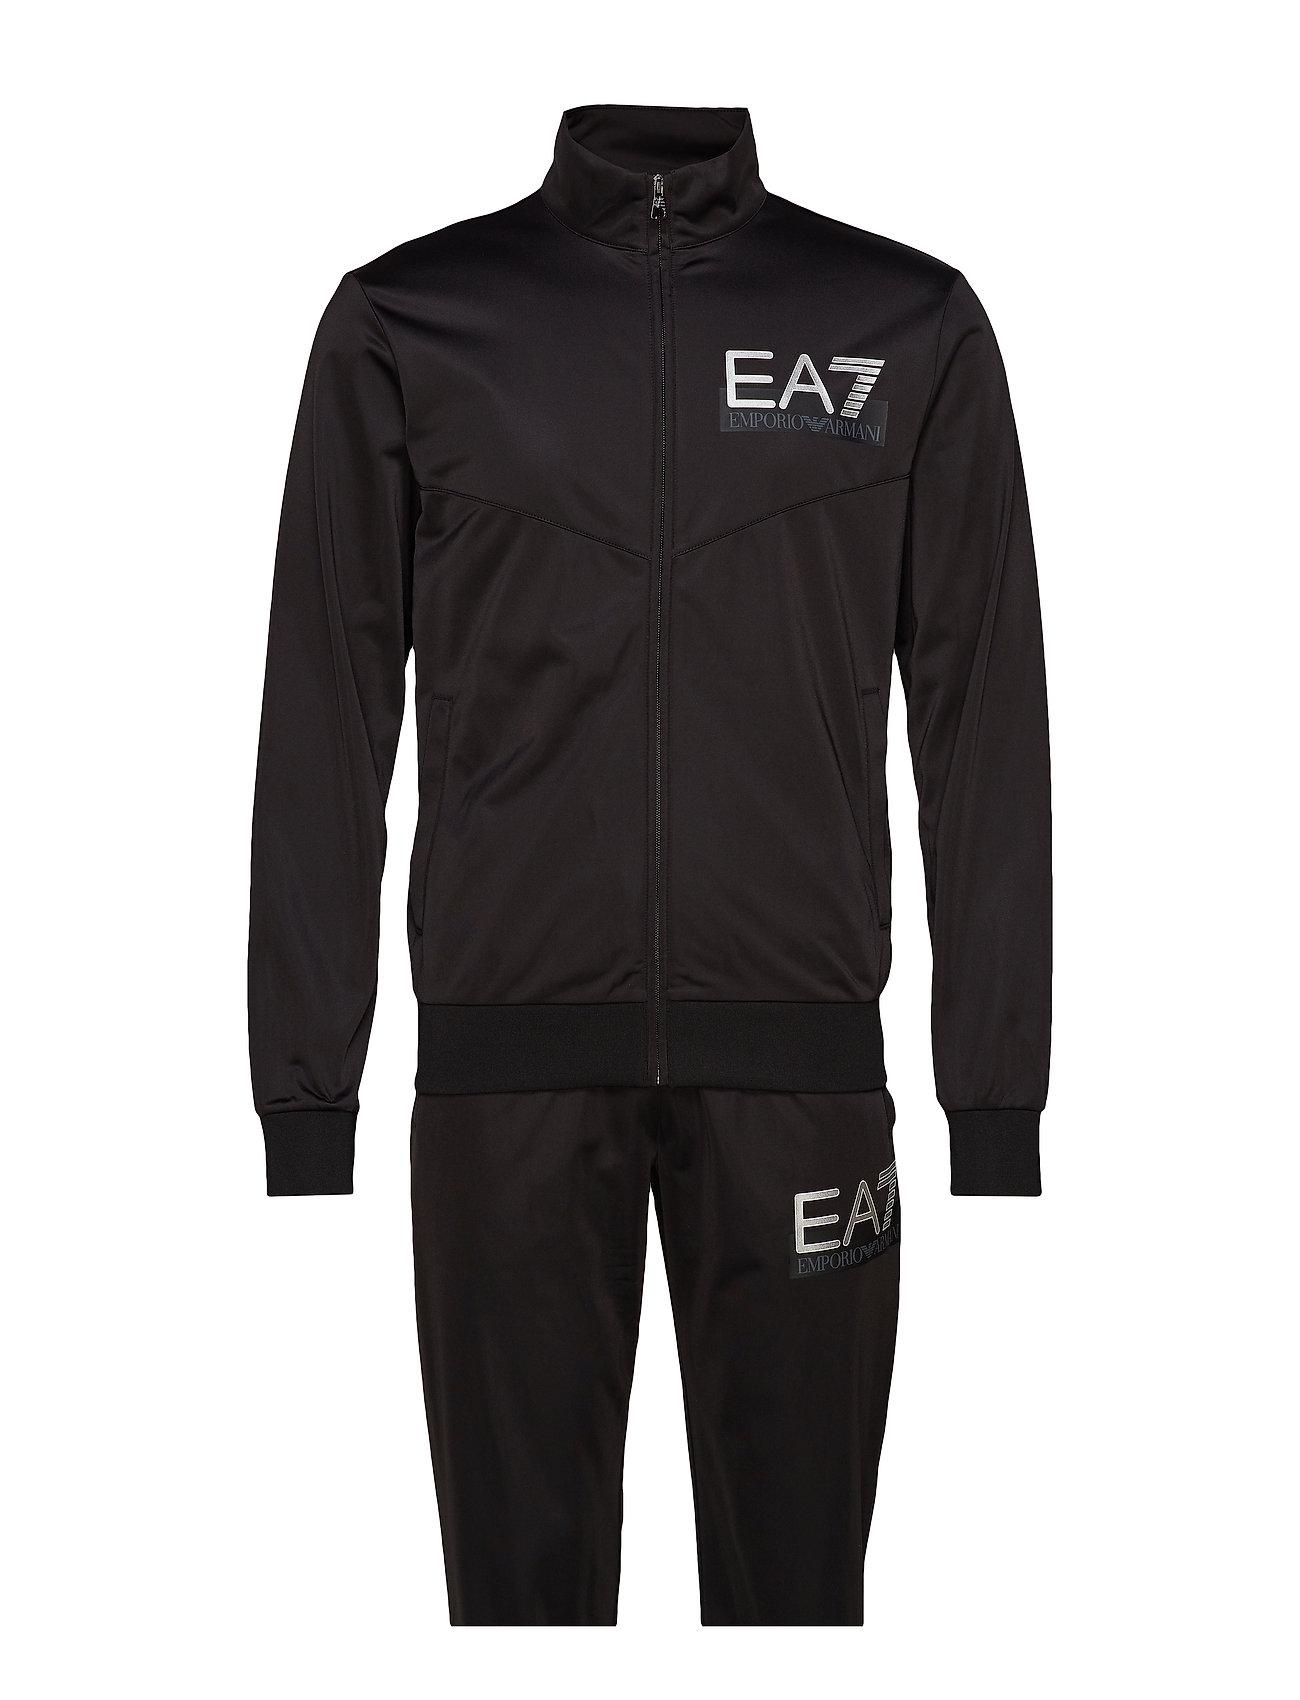 EA7 ZIP TRACK SUIT - BLACK